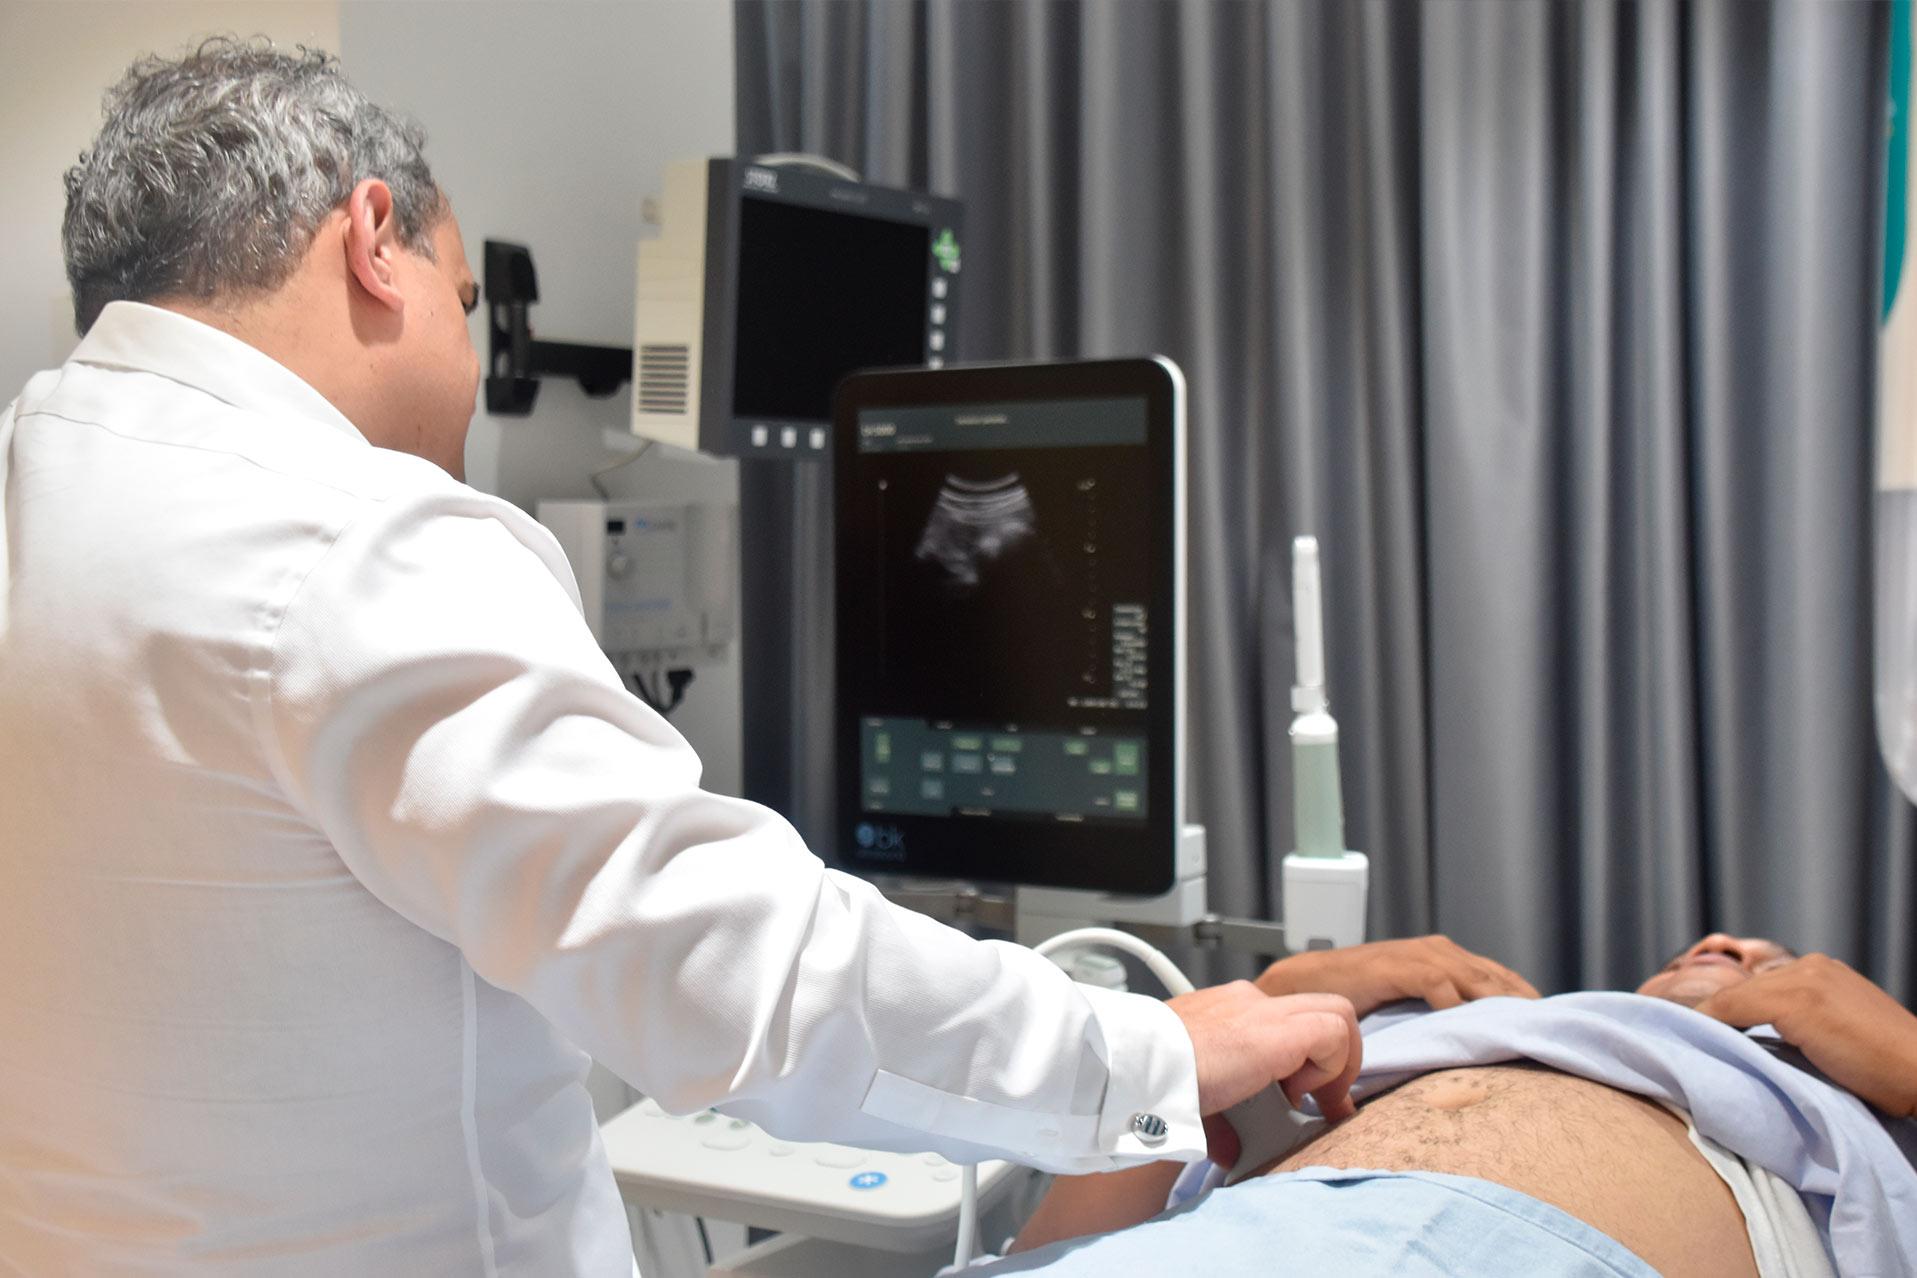 Urología e Innovación Prostagram: nuevo escáner no invasivo para próstata